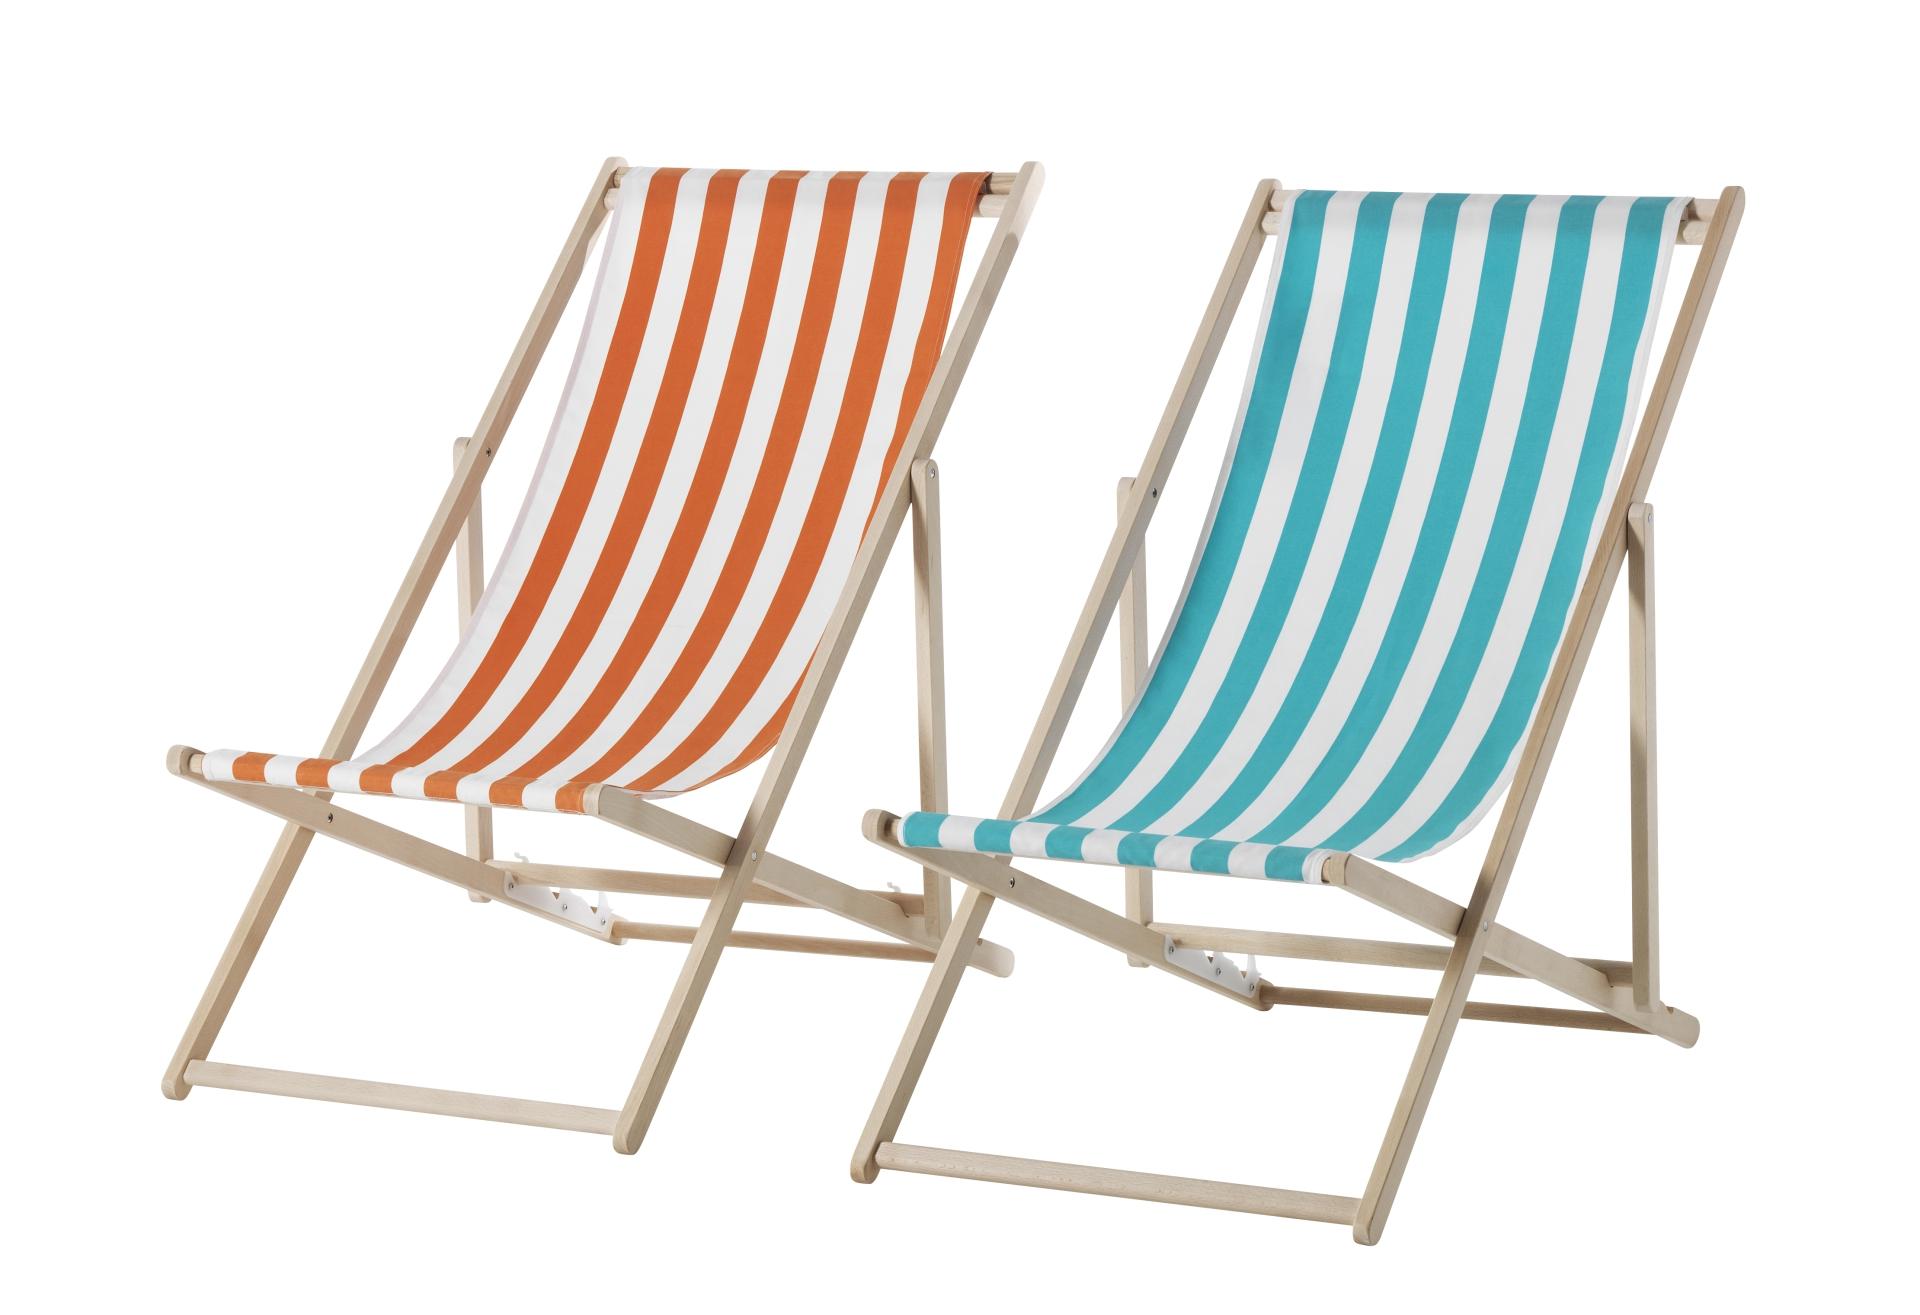 ikea recalls beach chairs